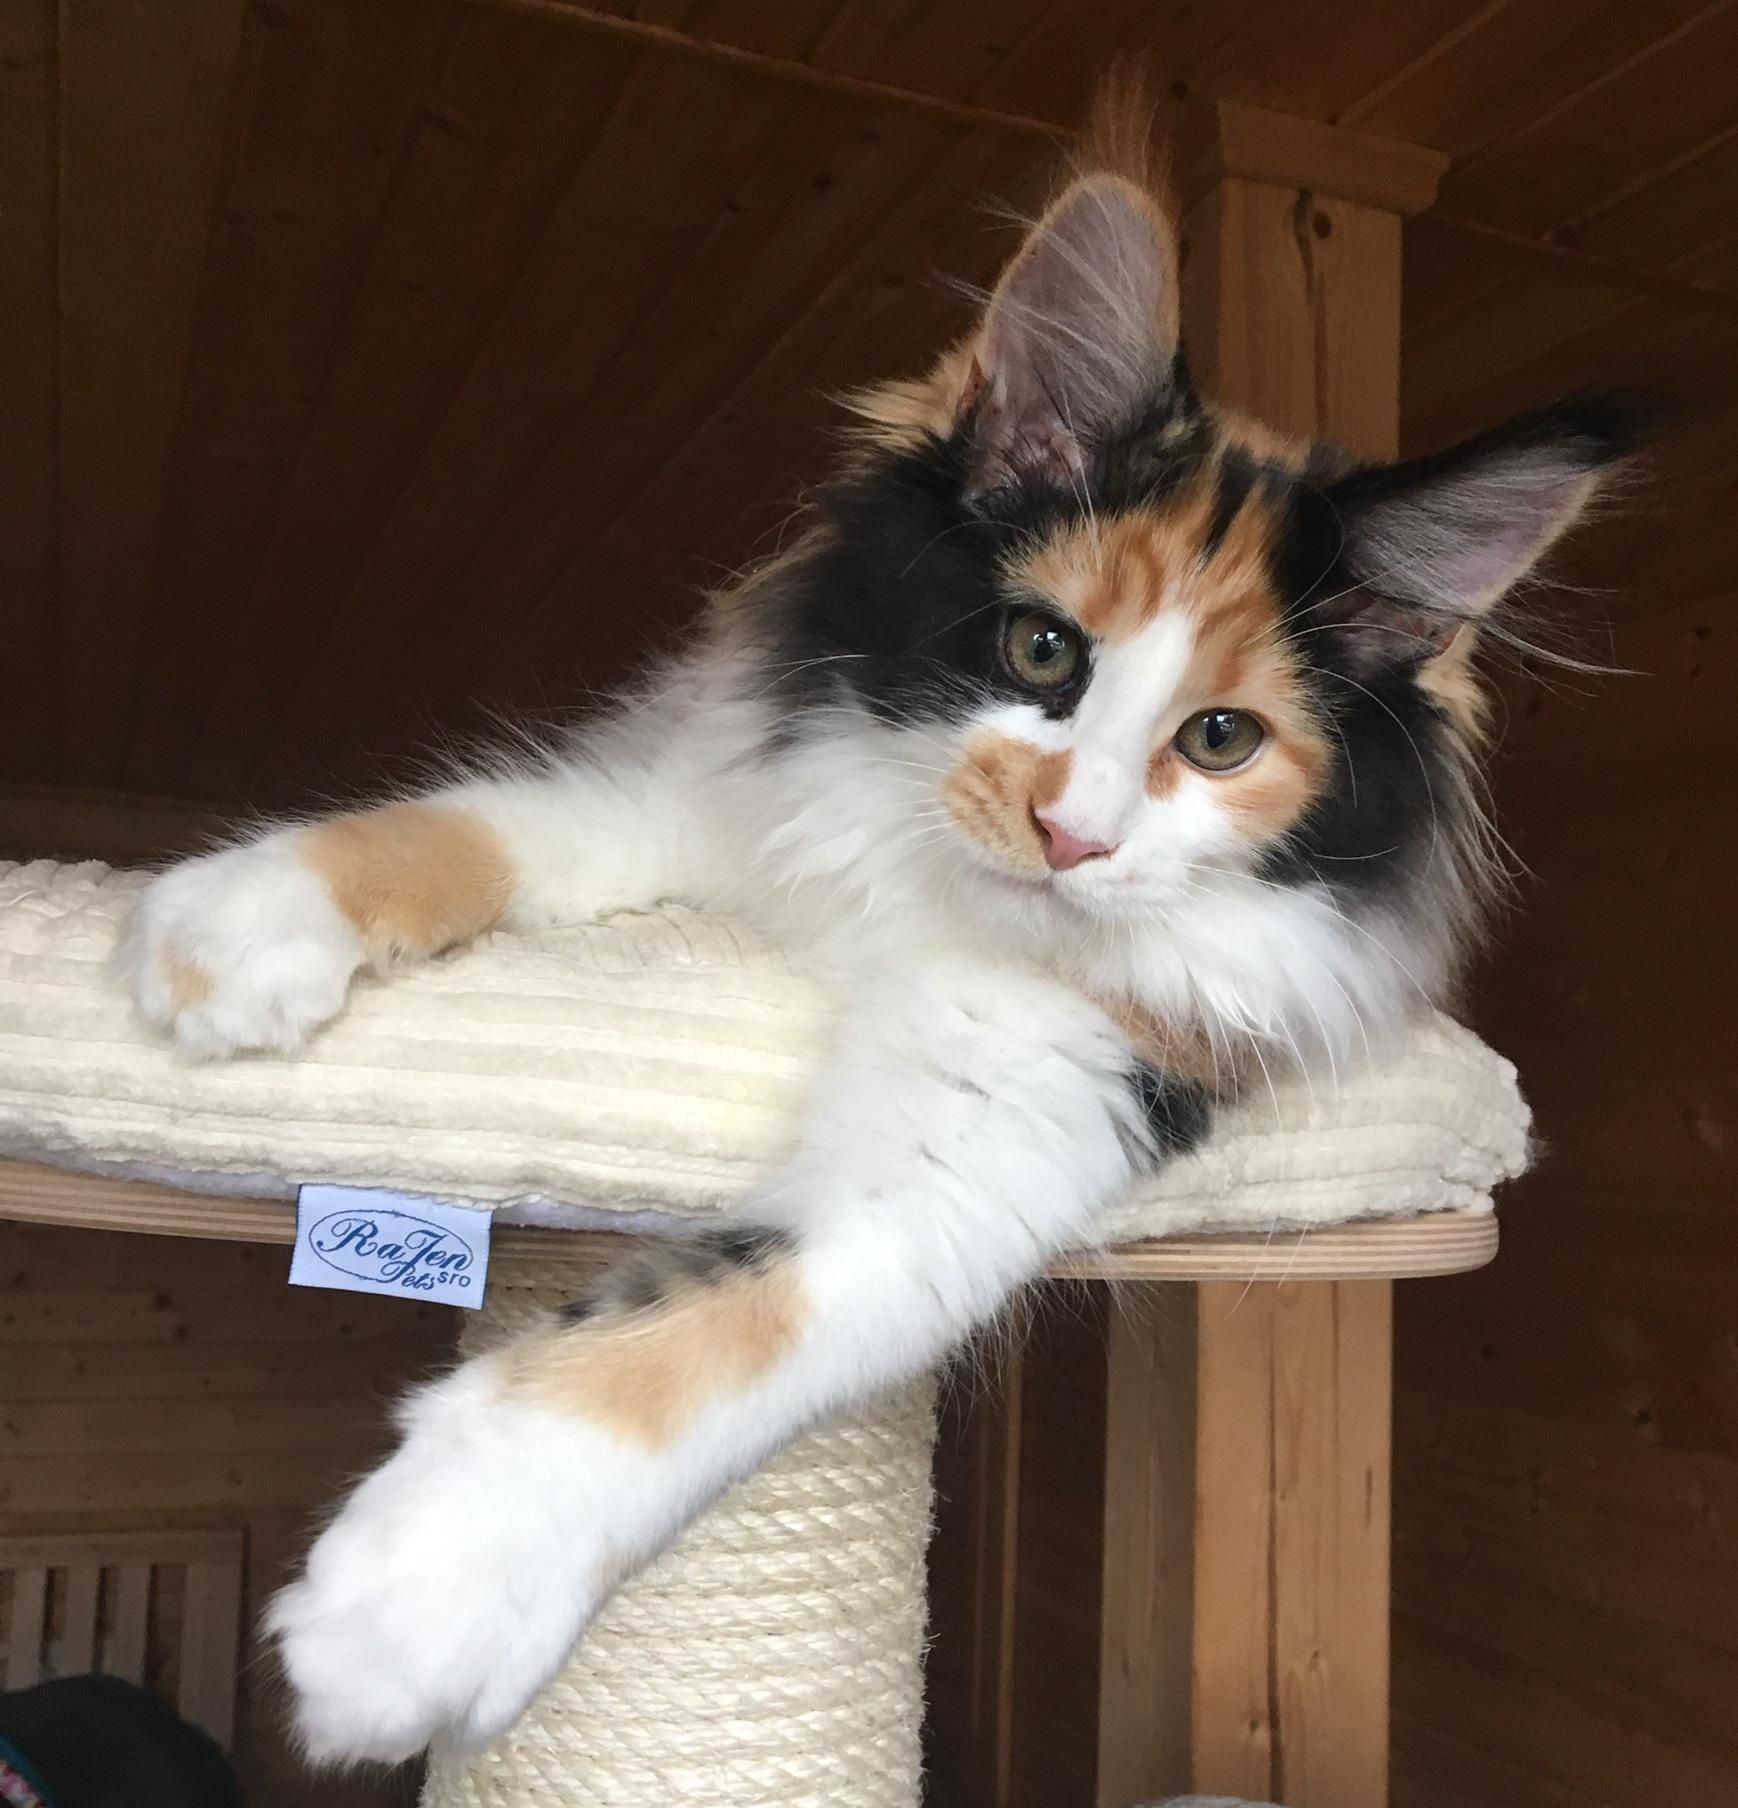 fotka kočky VRH E: ELSA von ERILLIAN*CZ   👧🏼